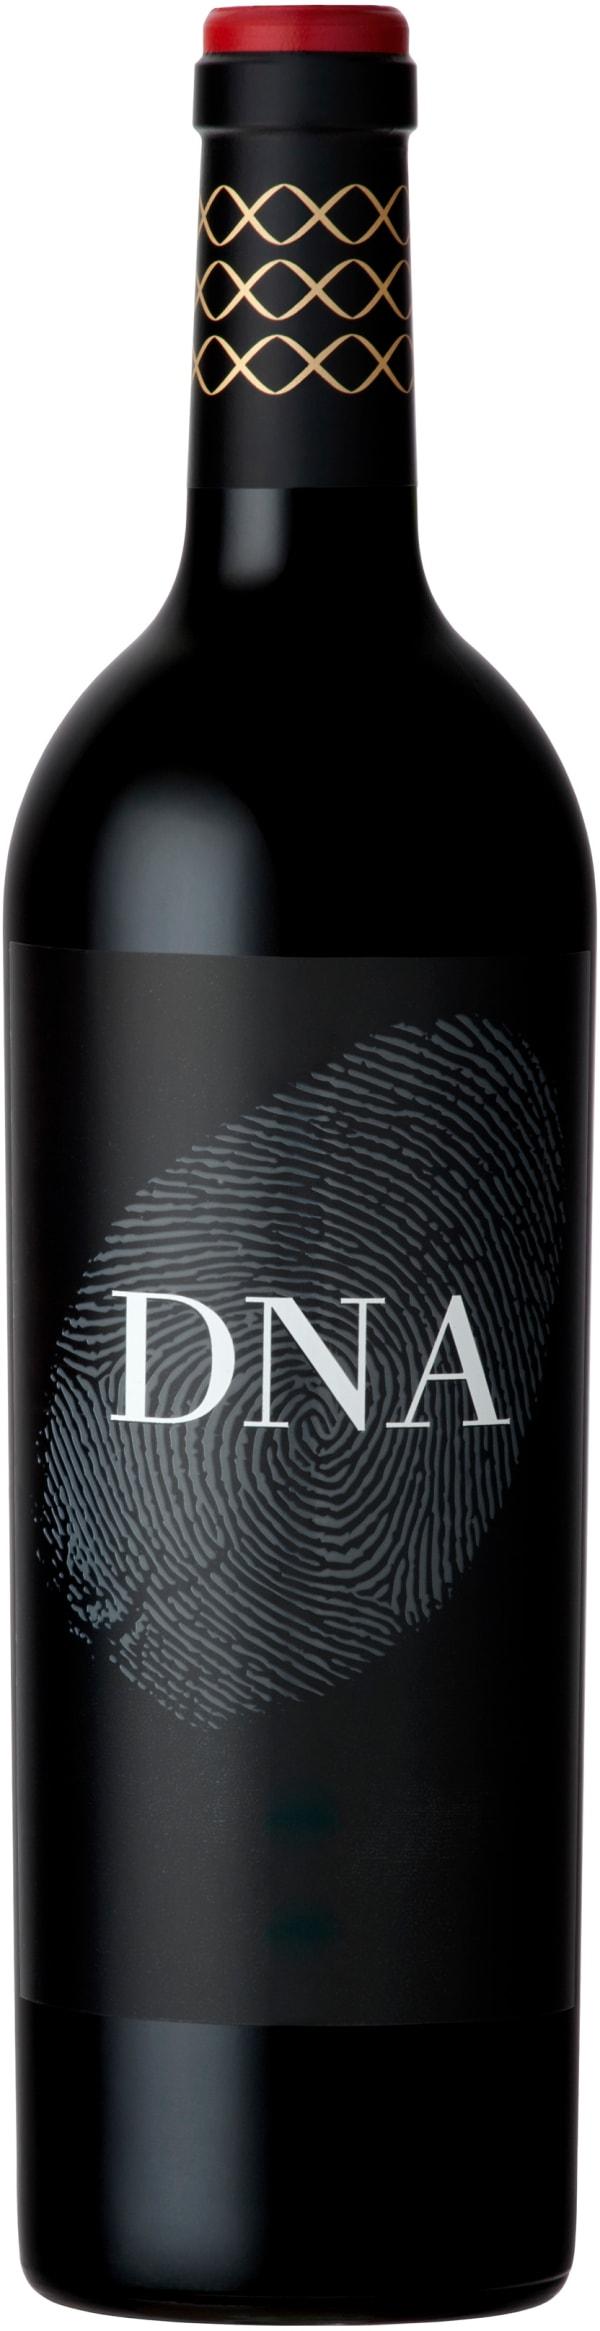 Vergelegen DNA 2013